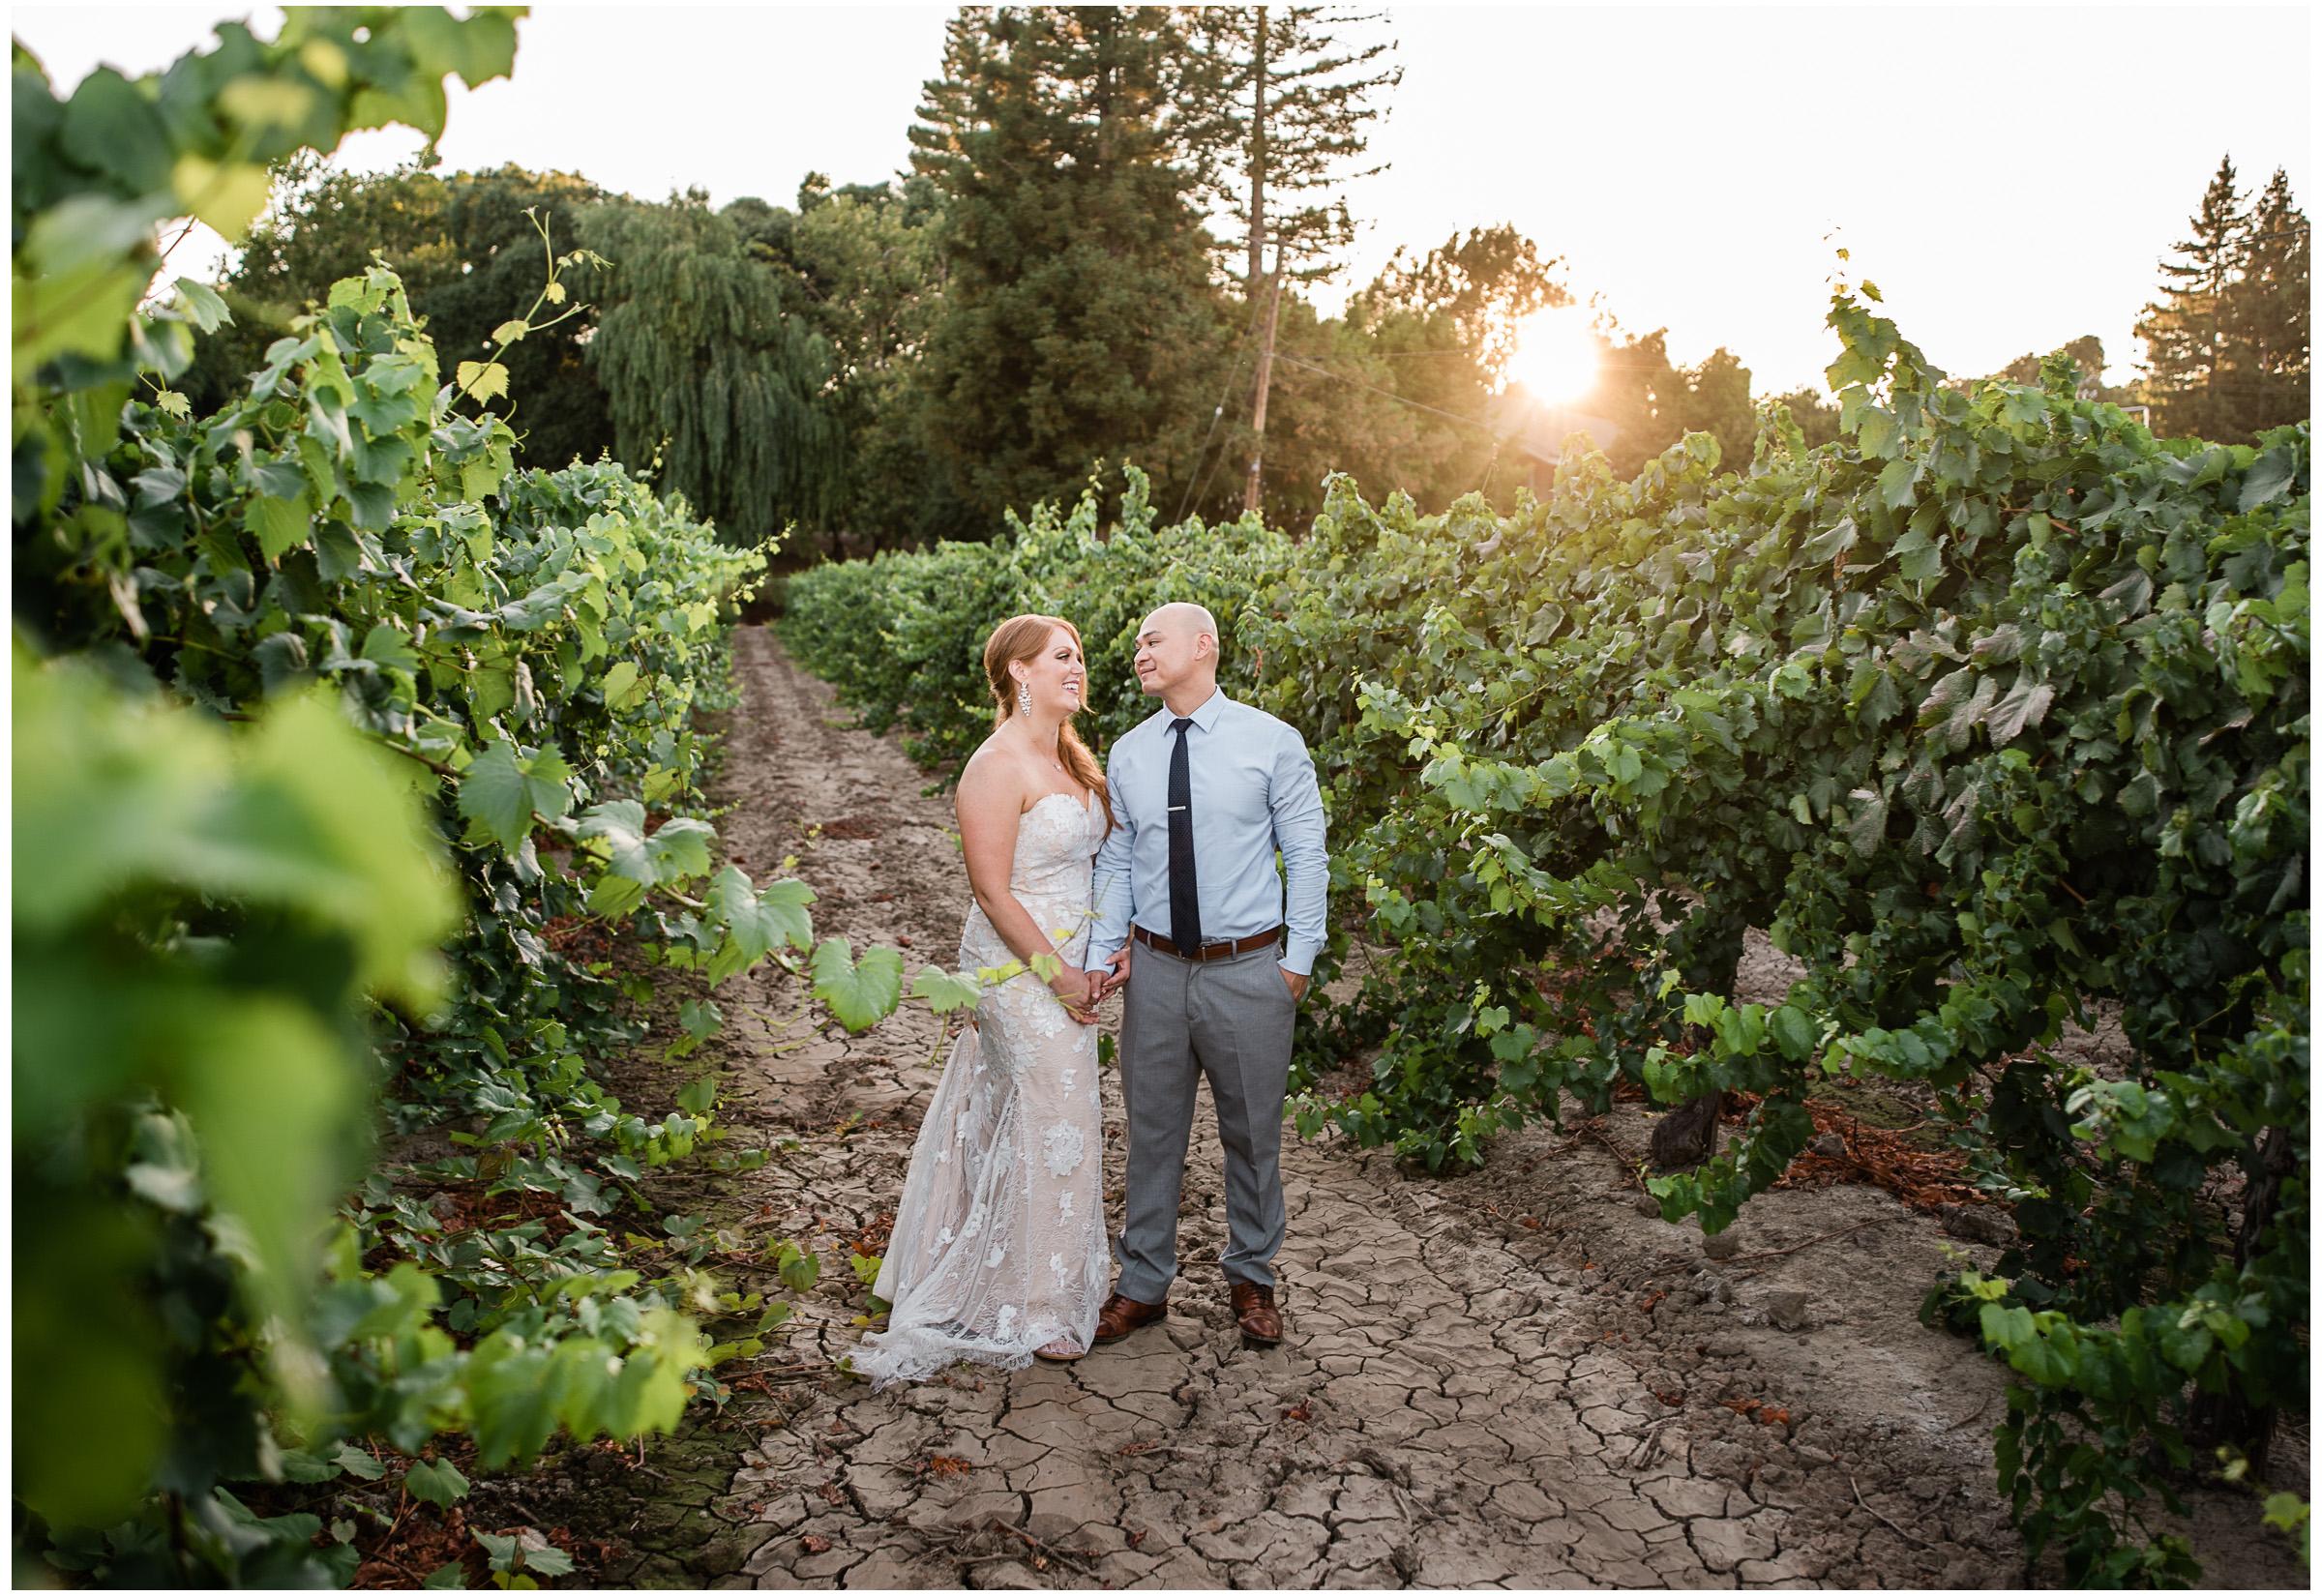 Clarksburg Wedding - Sacramento Photographer - Bogle Winery - Justin Wilcox Photography - 24.jpg